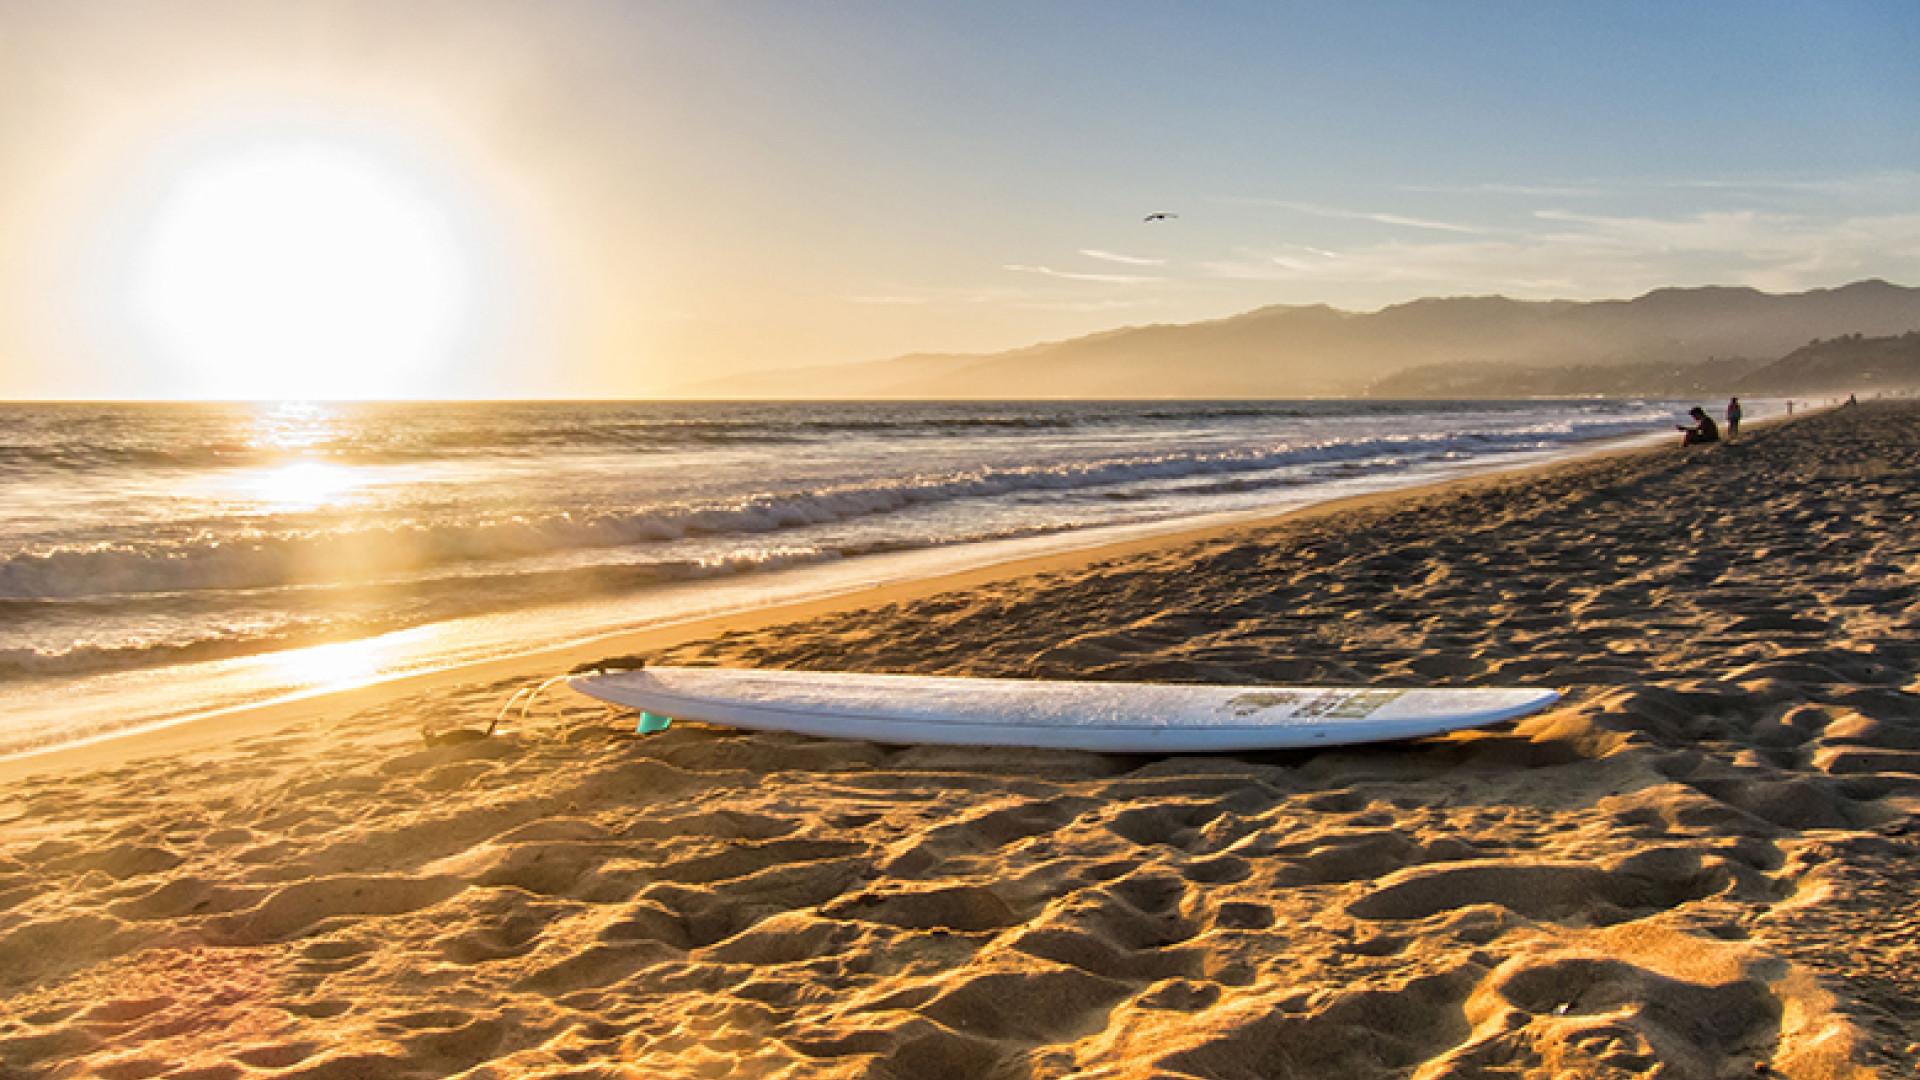 Beach-and-Surfboard